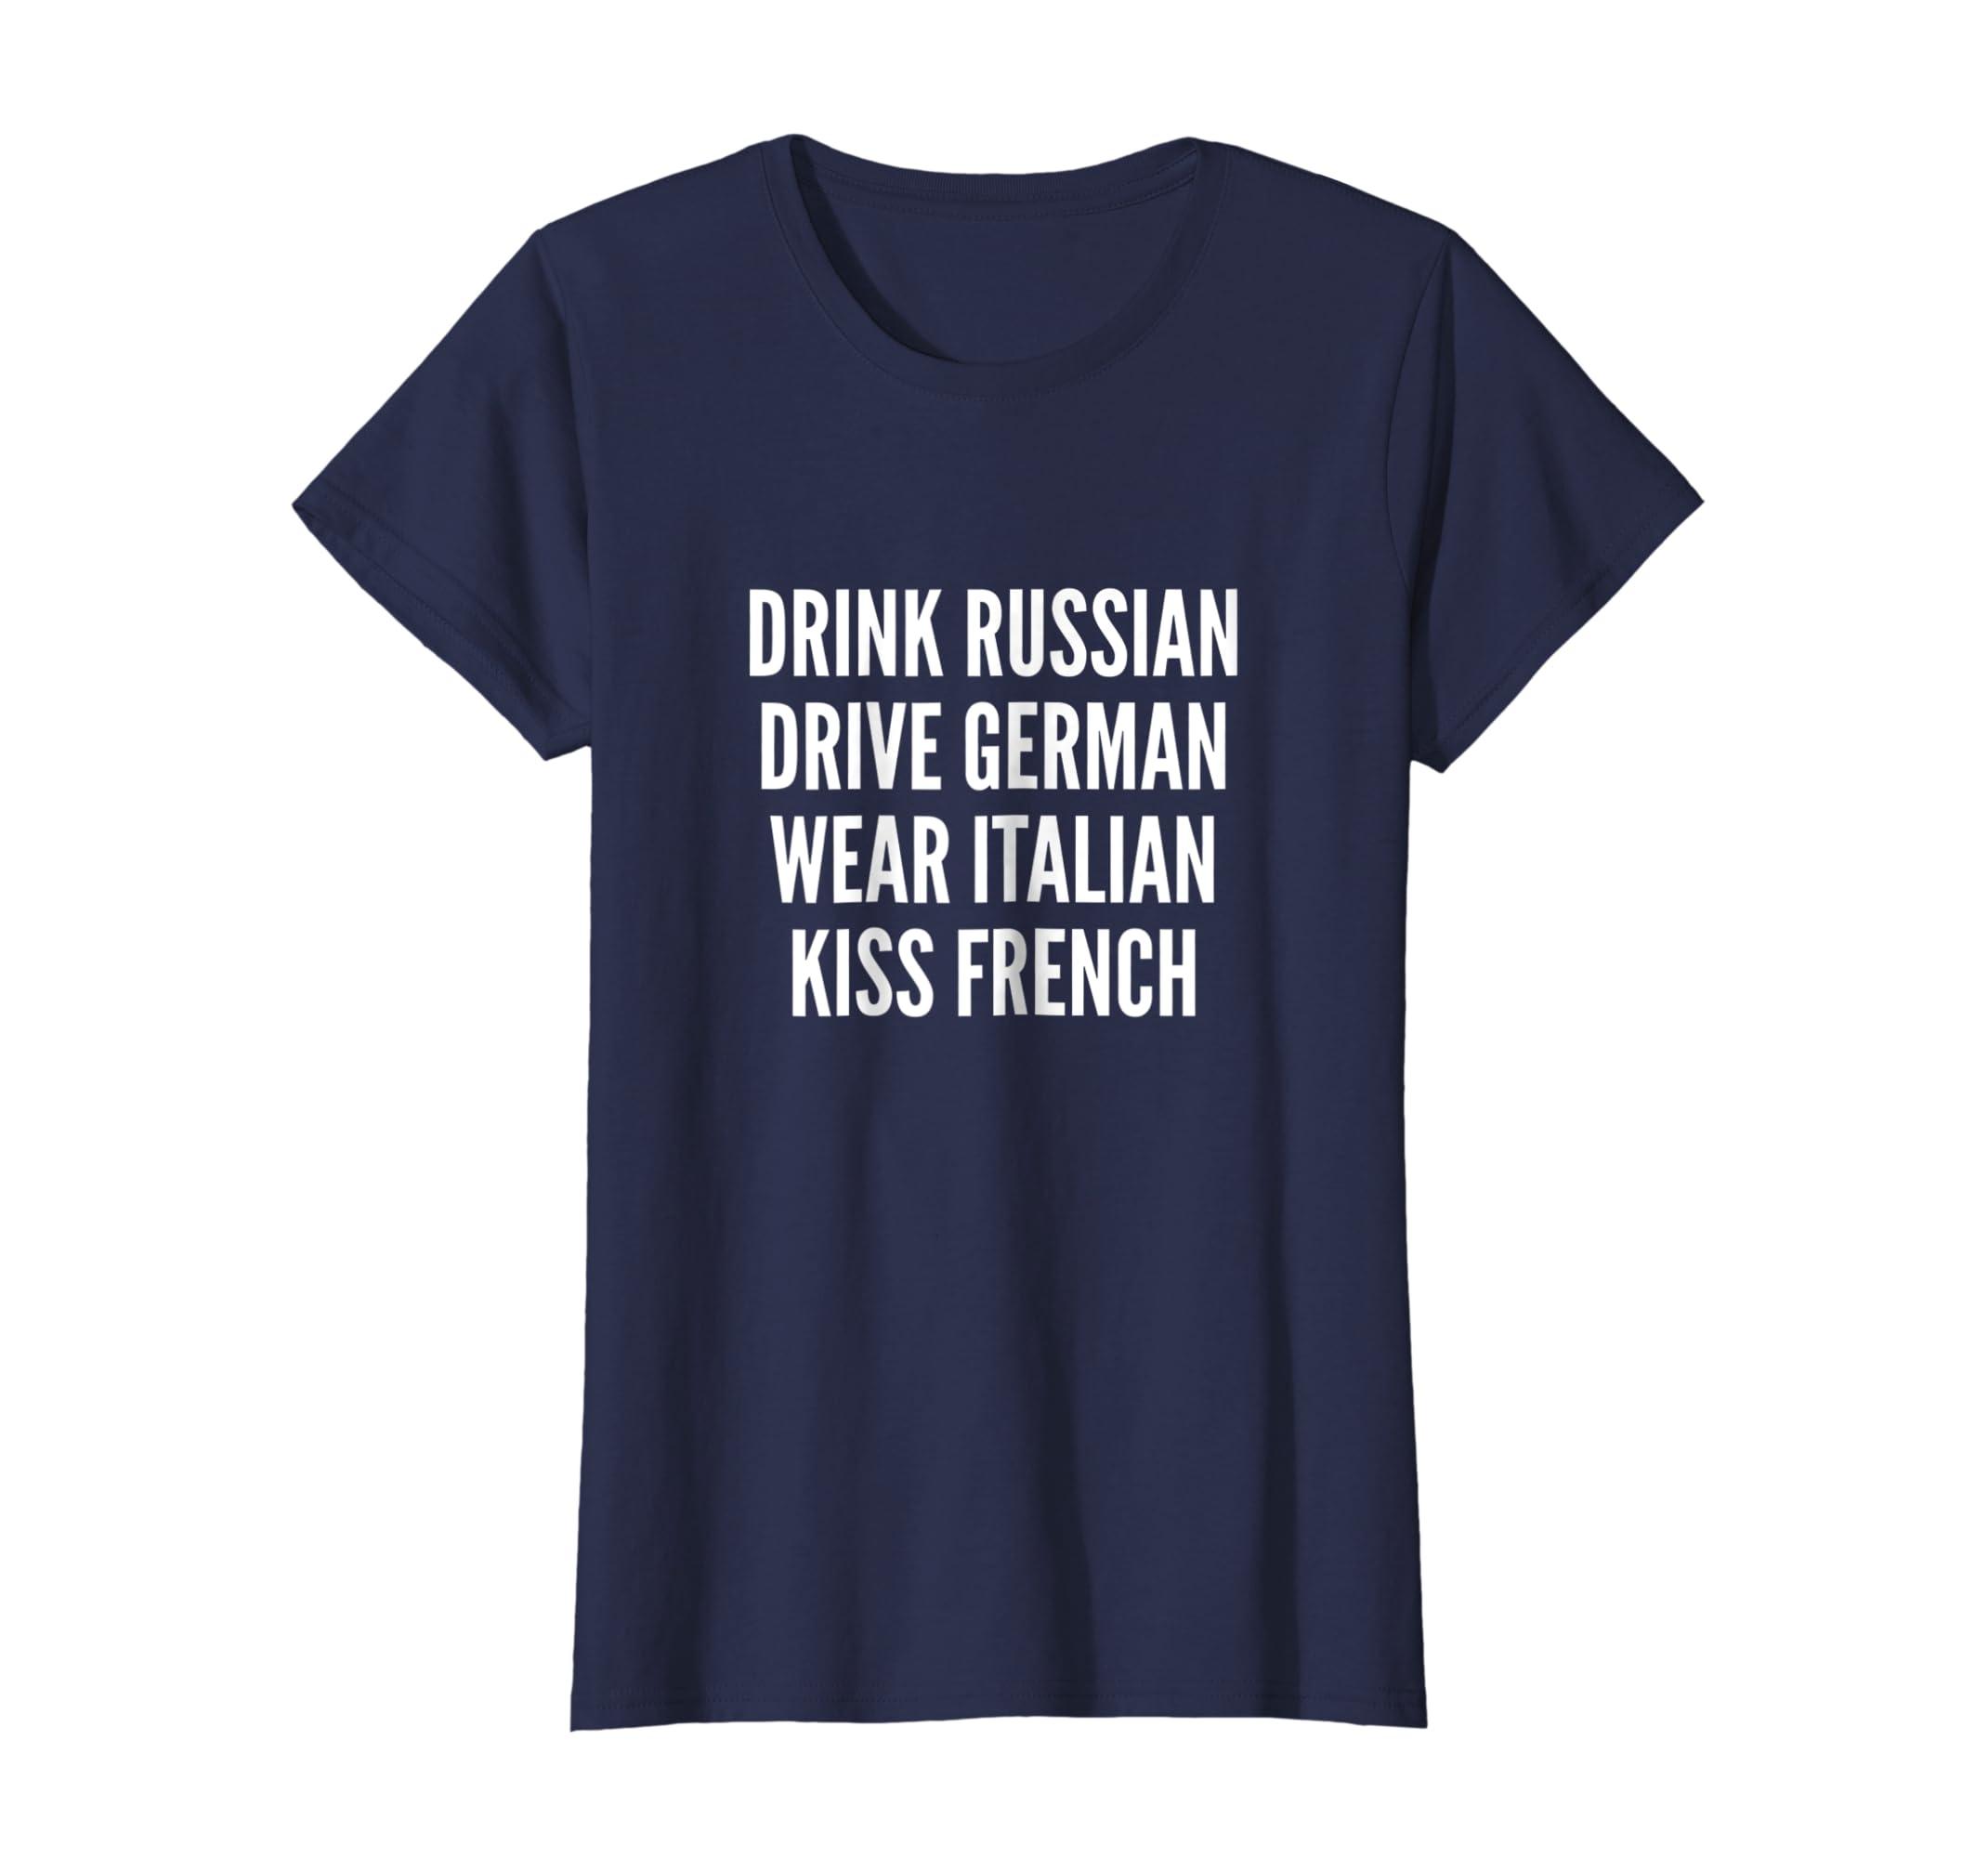 5e68bc7b8 Amazon.com: Drink Russian Drive German Wear Italian Kiss French T-Shirt:  Clothing